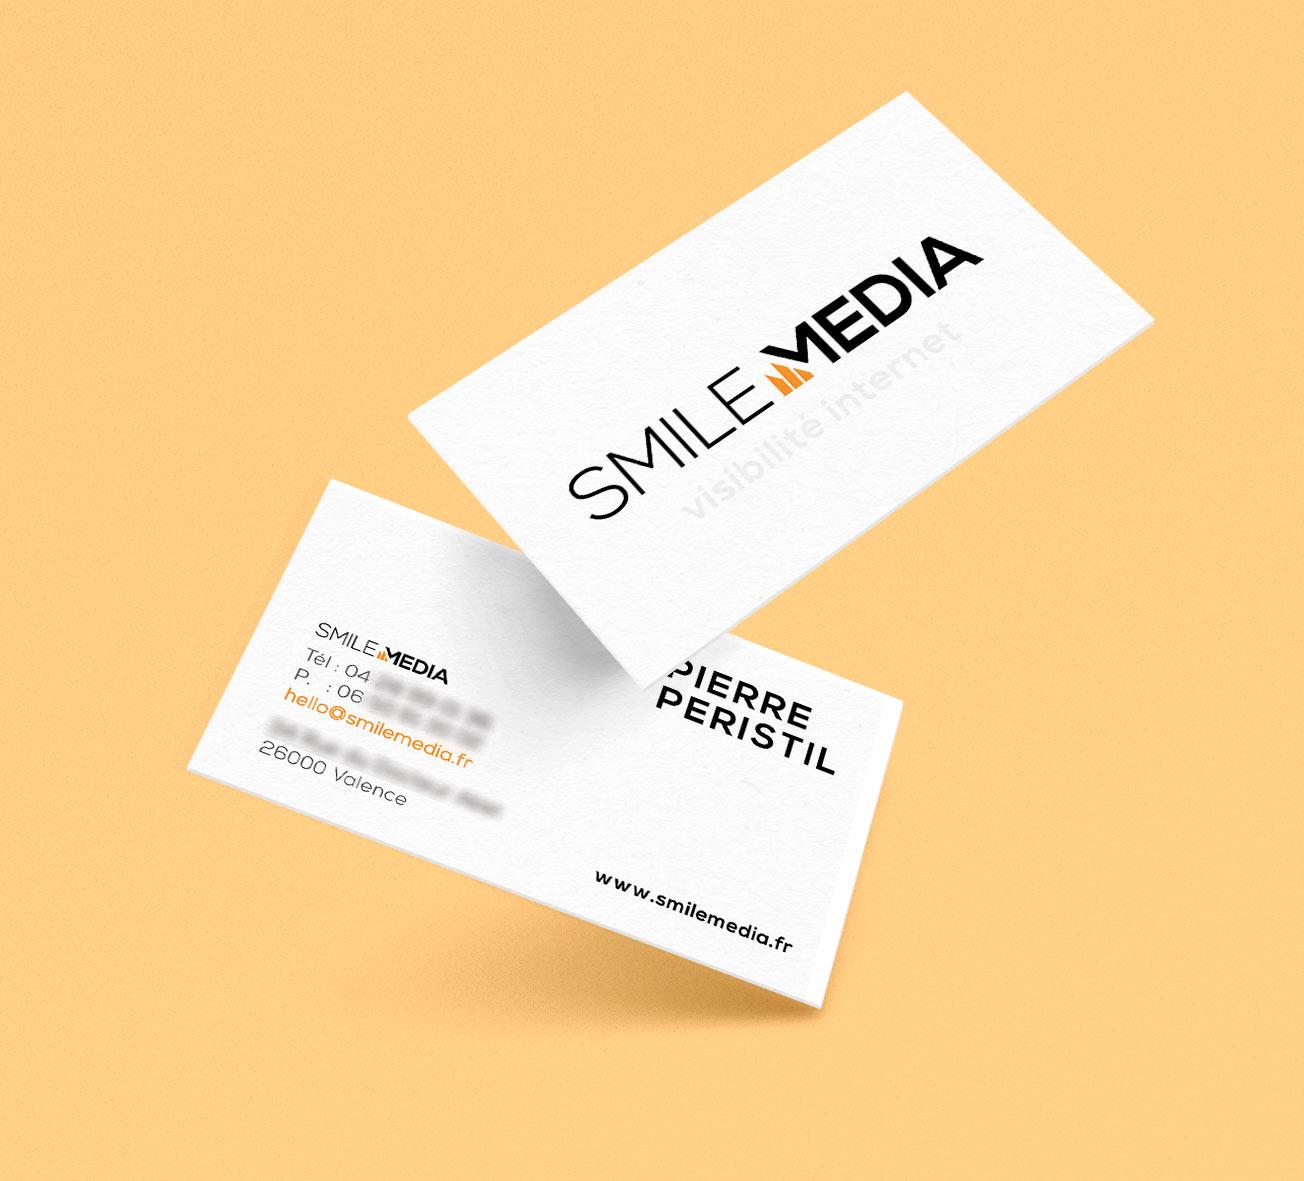 SmileMedia_Logo_carte_de_visite